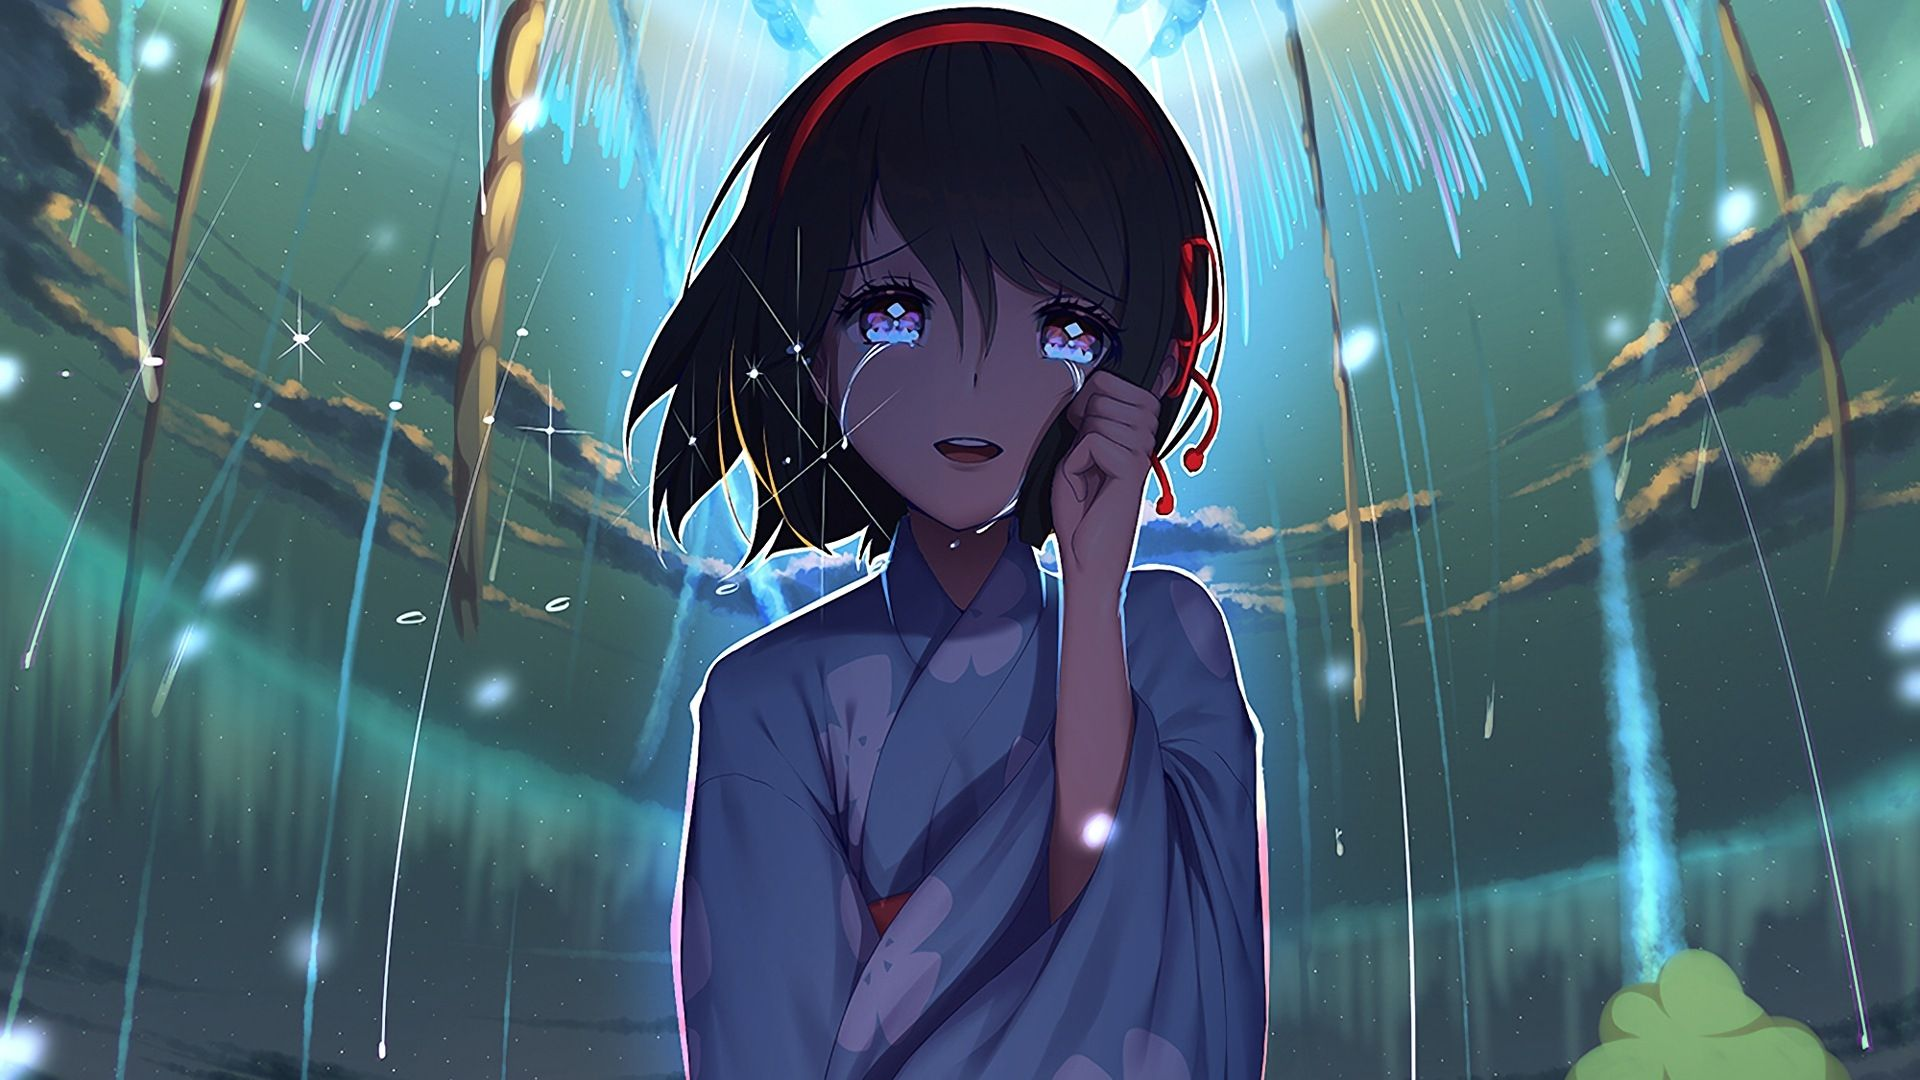 Broken Heart Sad Anime Wallpaper Computer Anime Wallpaper Hd